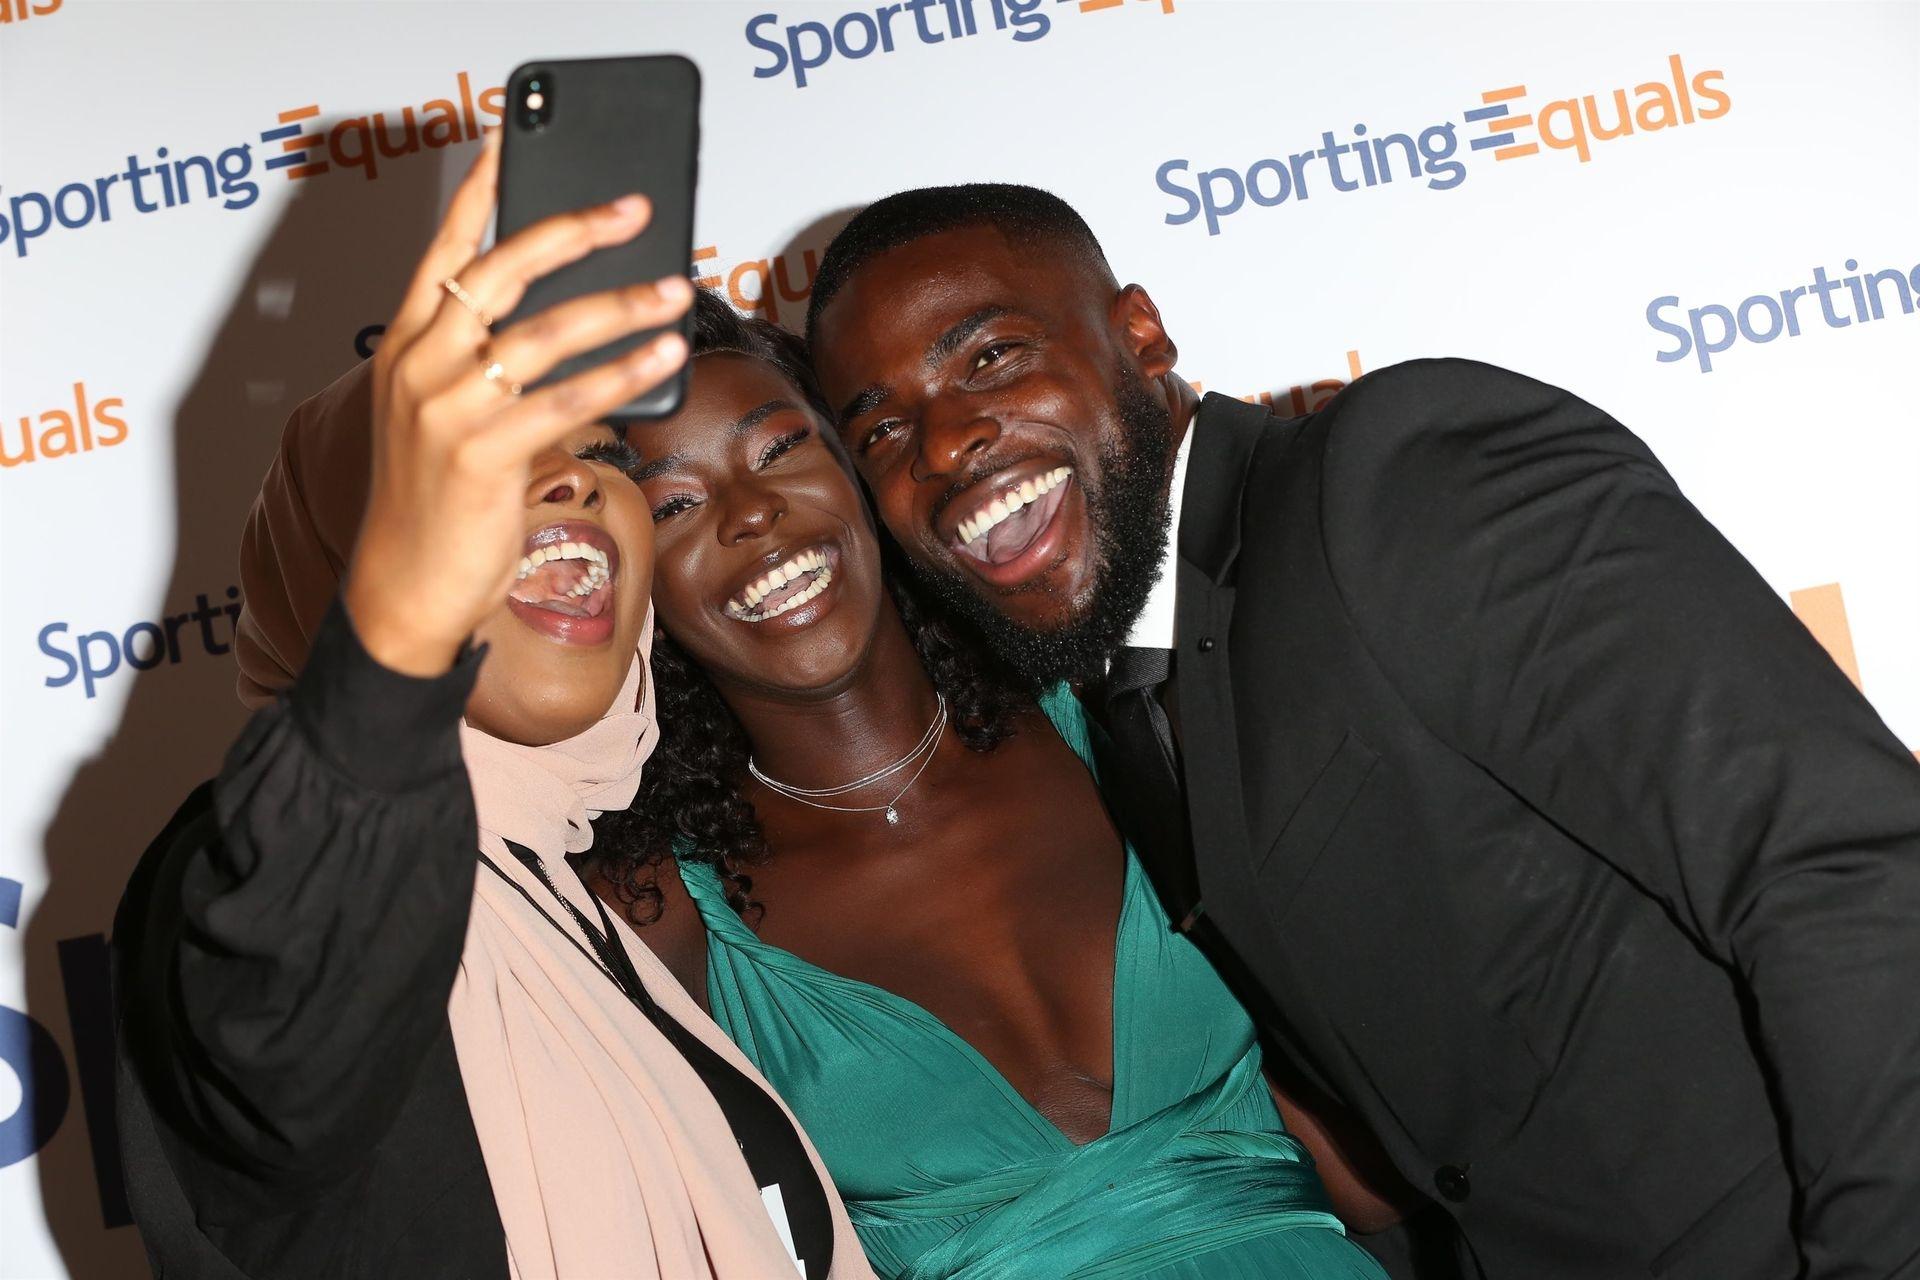 Mike Boateng & Priscilla Anyabu Are Seen At British Ethnic Diversity Sports Awards 0080